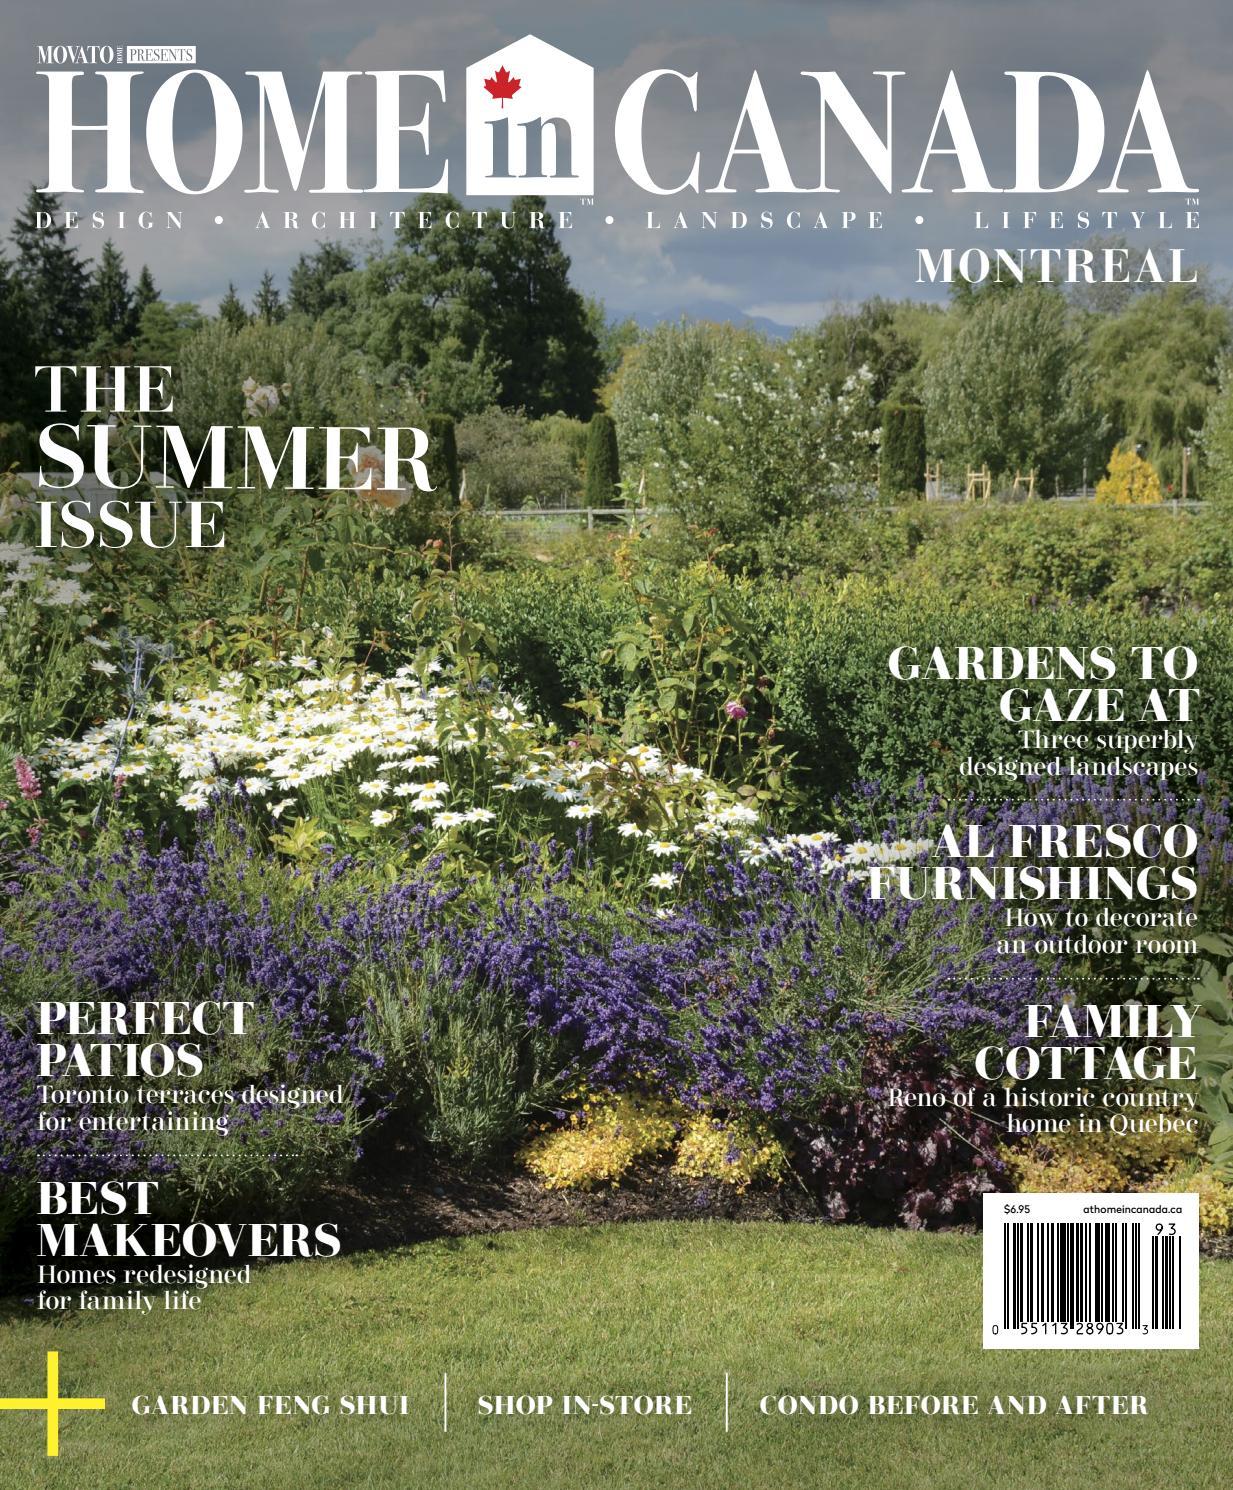 Dimension Terrain De Petanque Maison home in canada - montreal - summer 2019home in canada